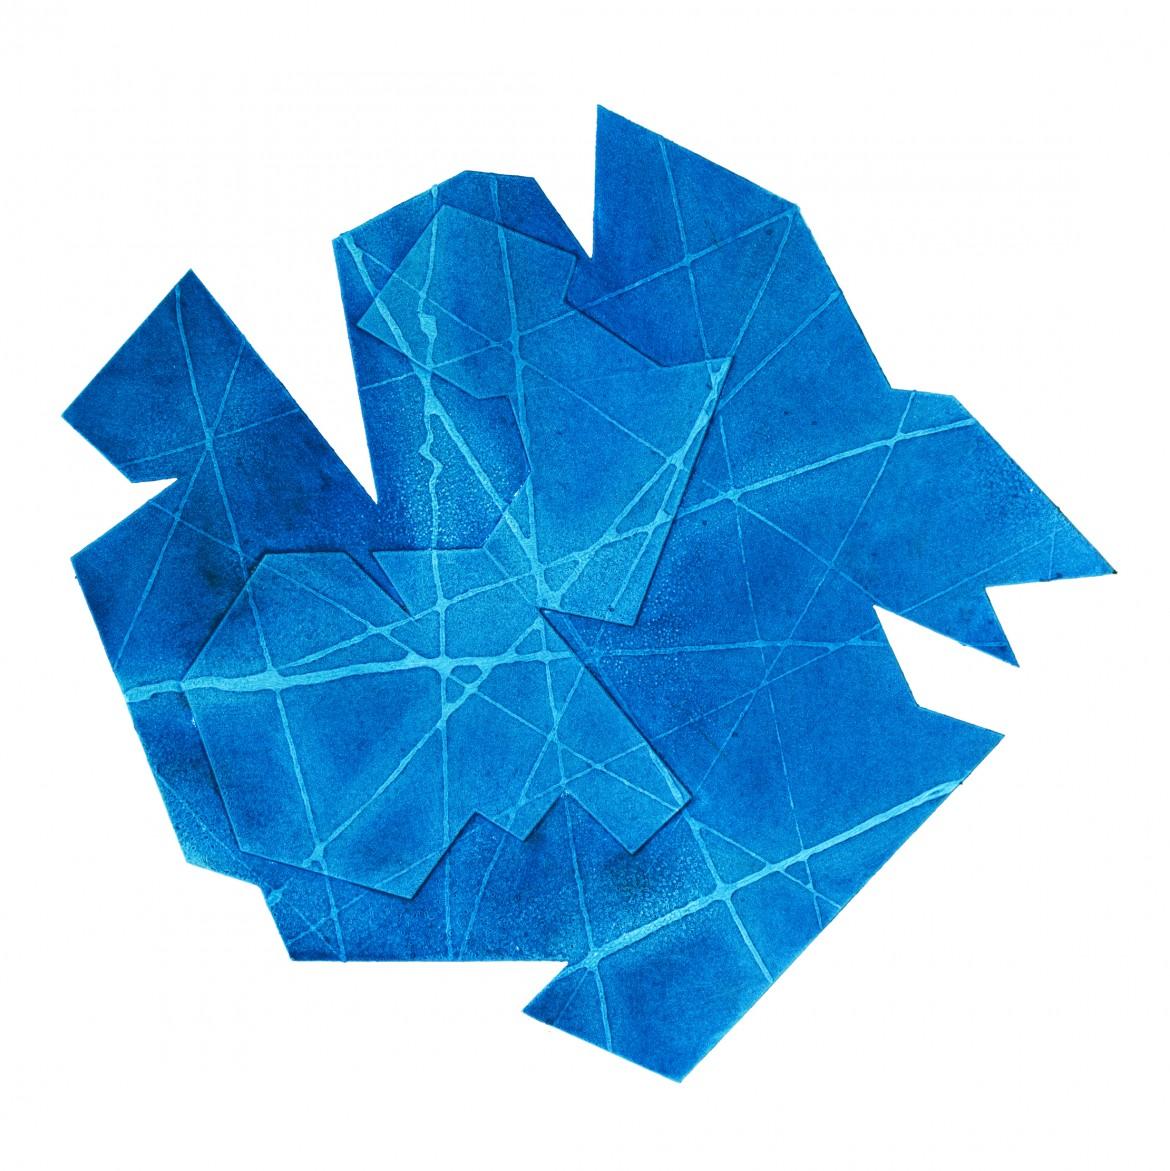 Sinclair Ashman: 'Geometry II Blue'. Collagraph print.